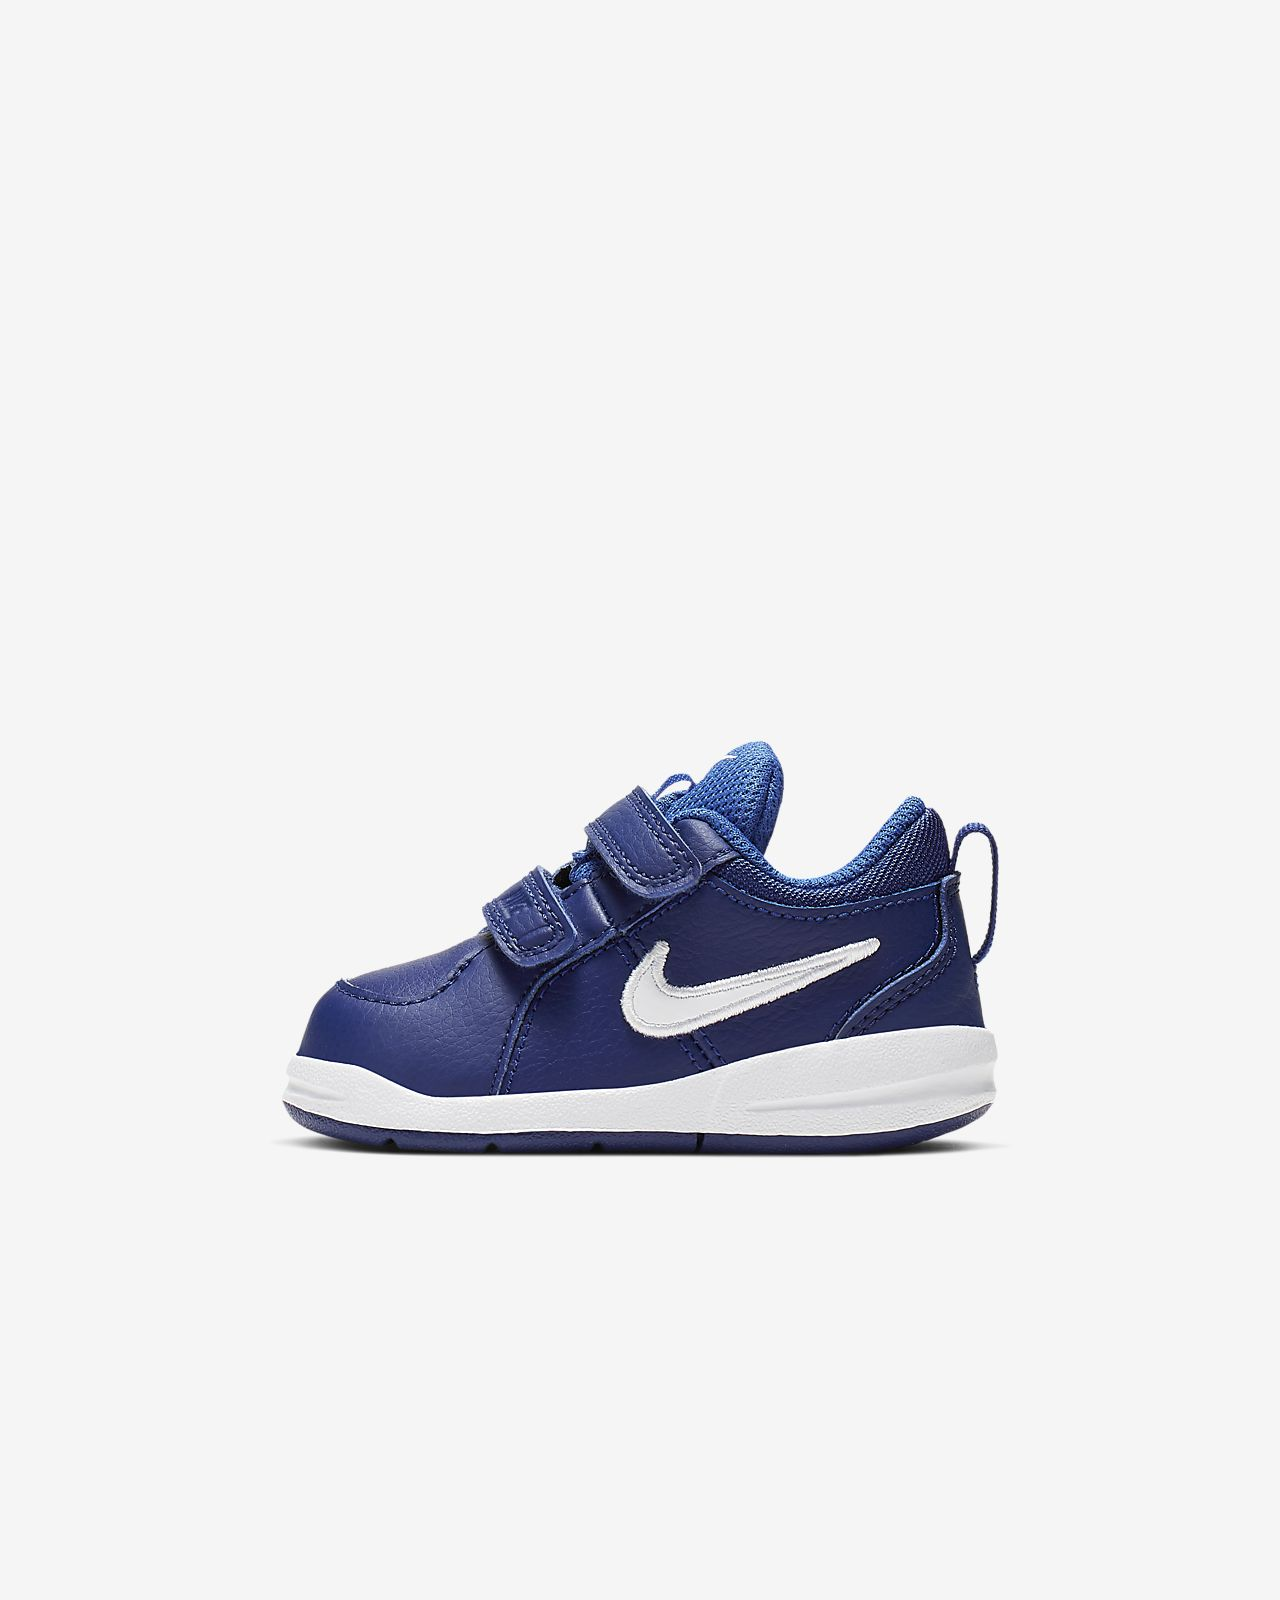 info for aa91a 19741 Nike Pico 4 Baby   Toddler Shoe. Nike.com AU